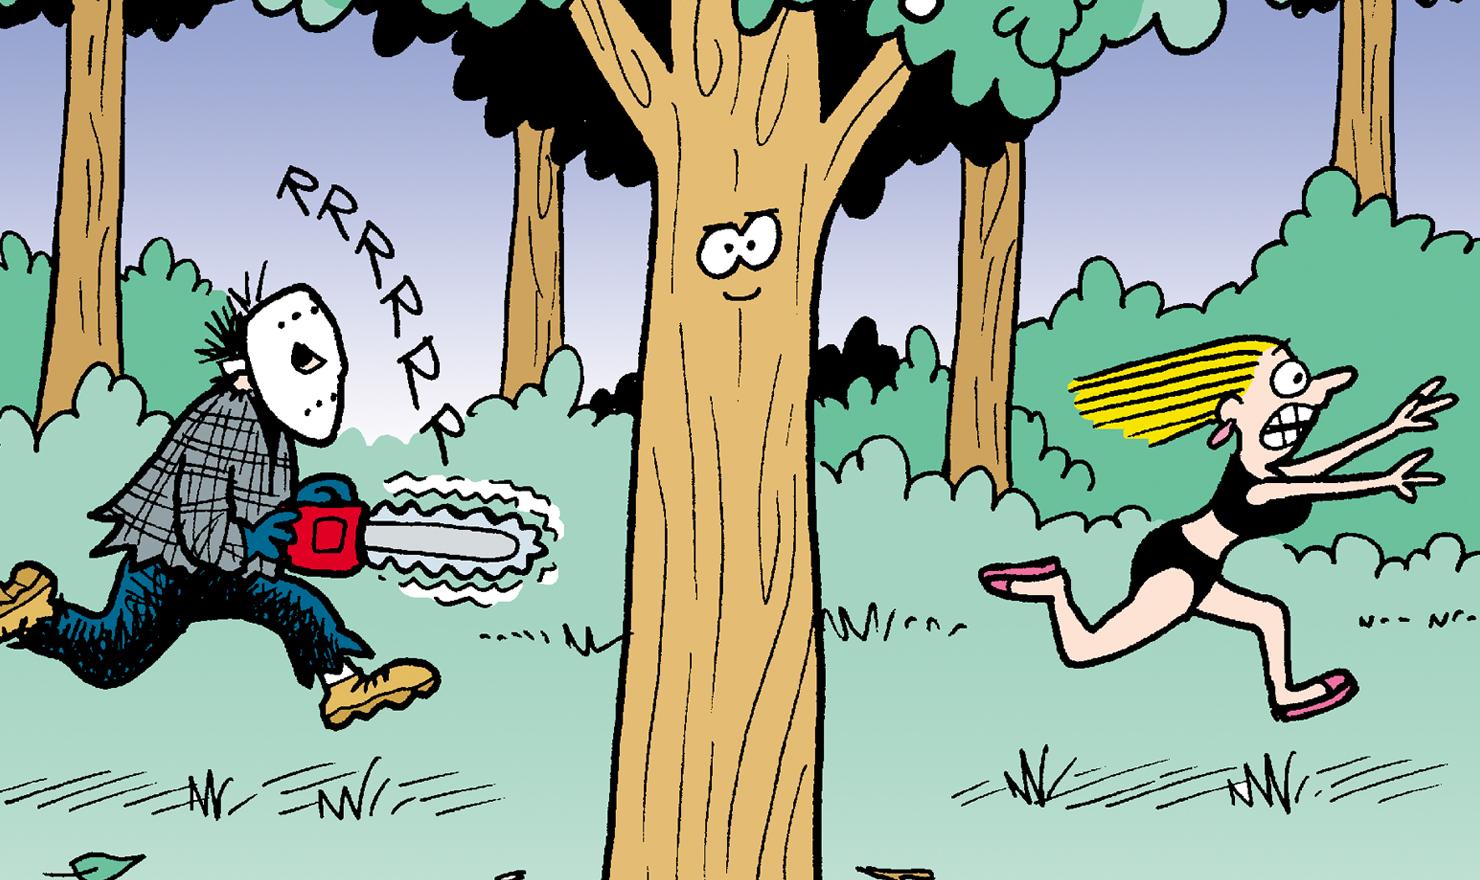 13 comics for friday the 13th - gocomics